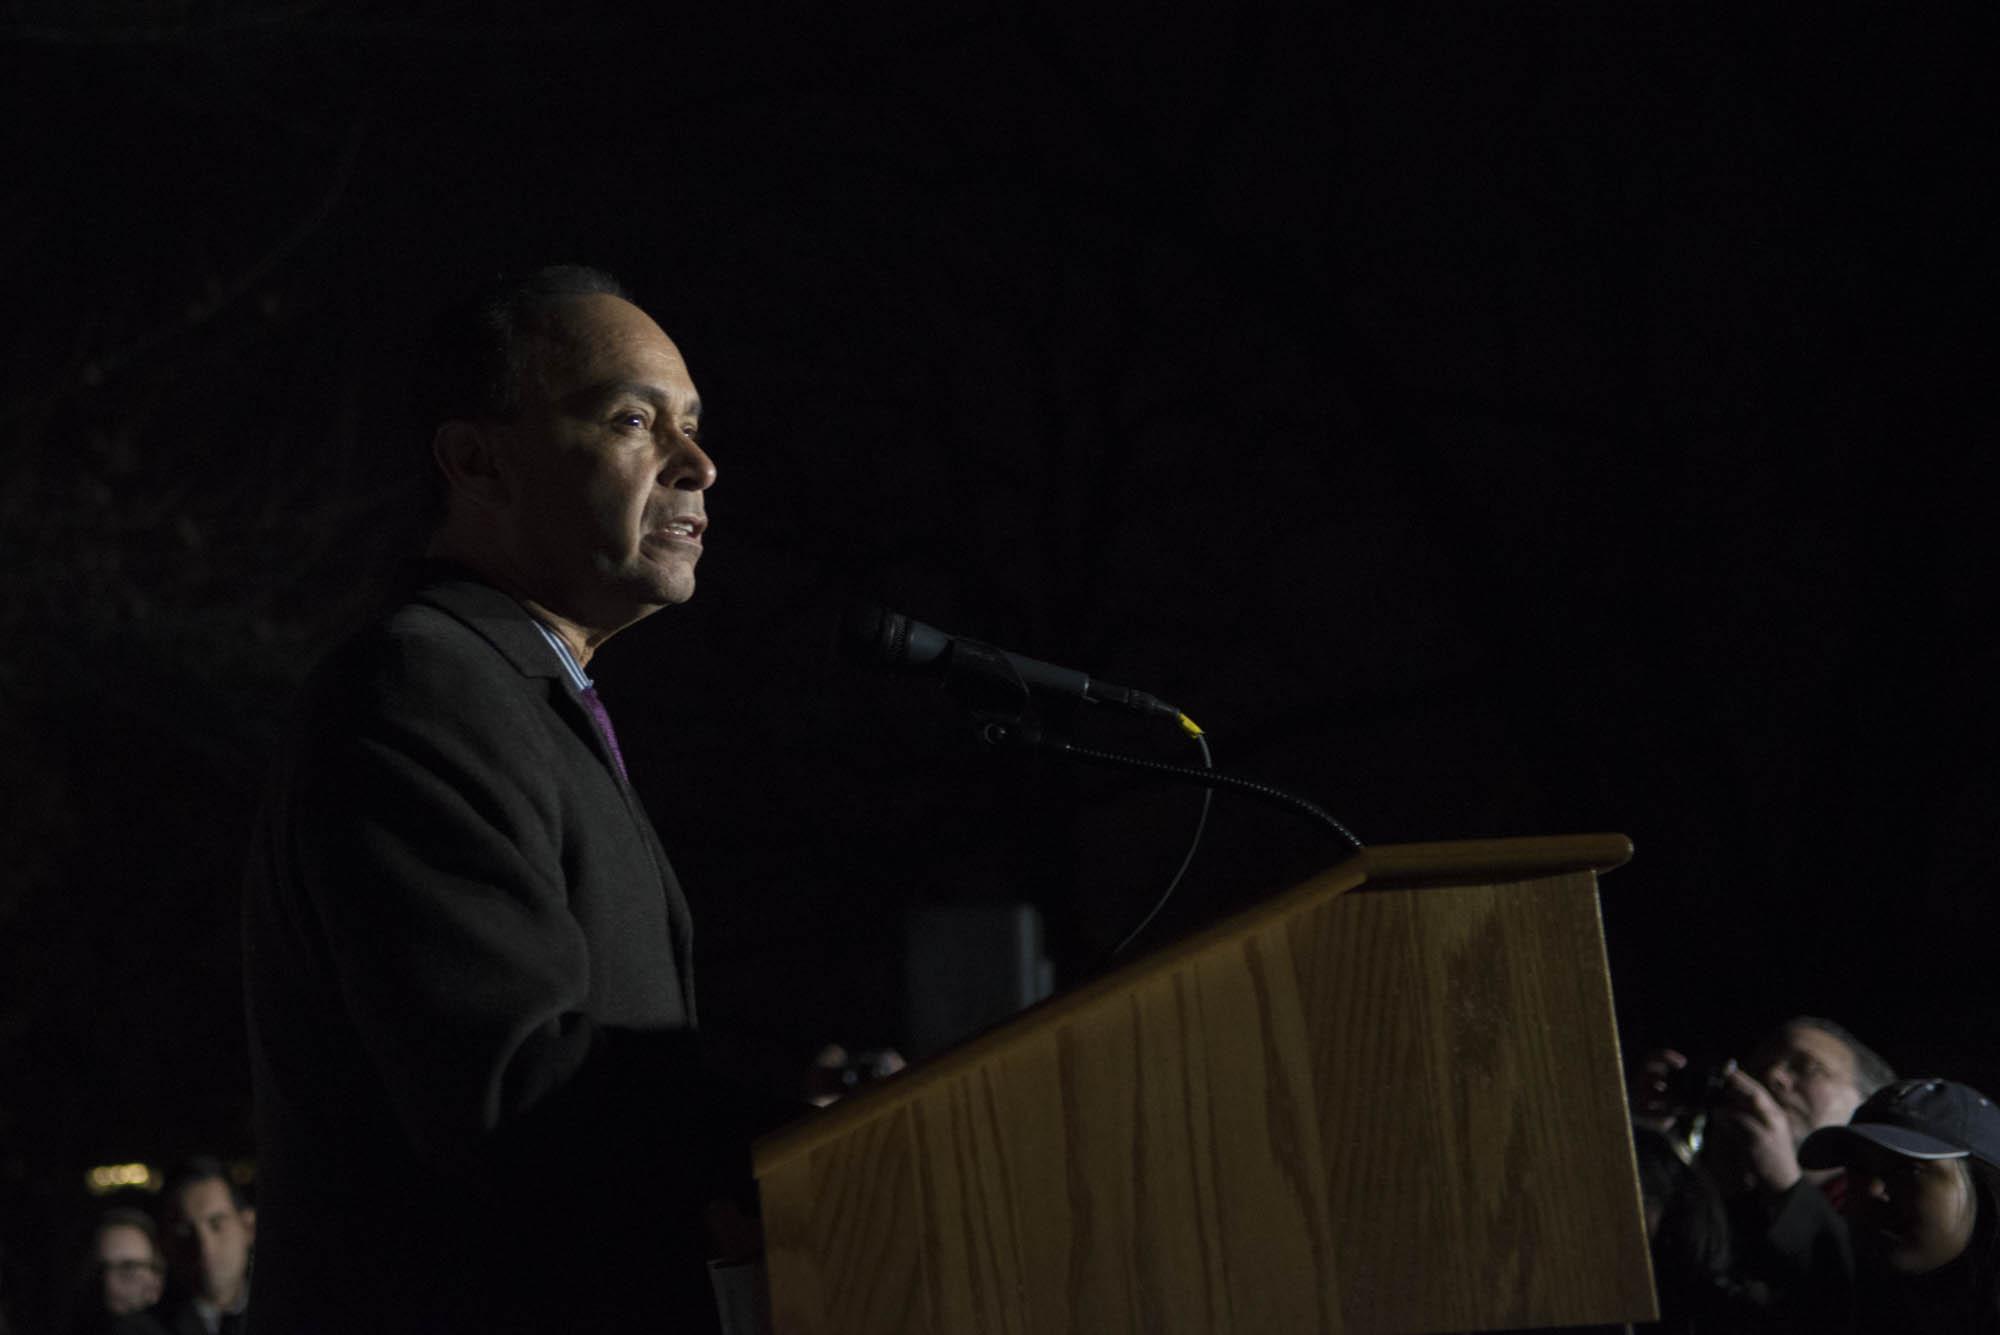 Representative Luis Gutiérrez of Illinois